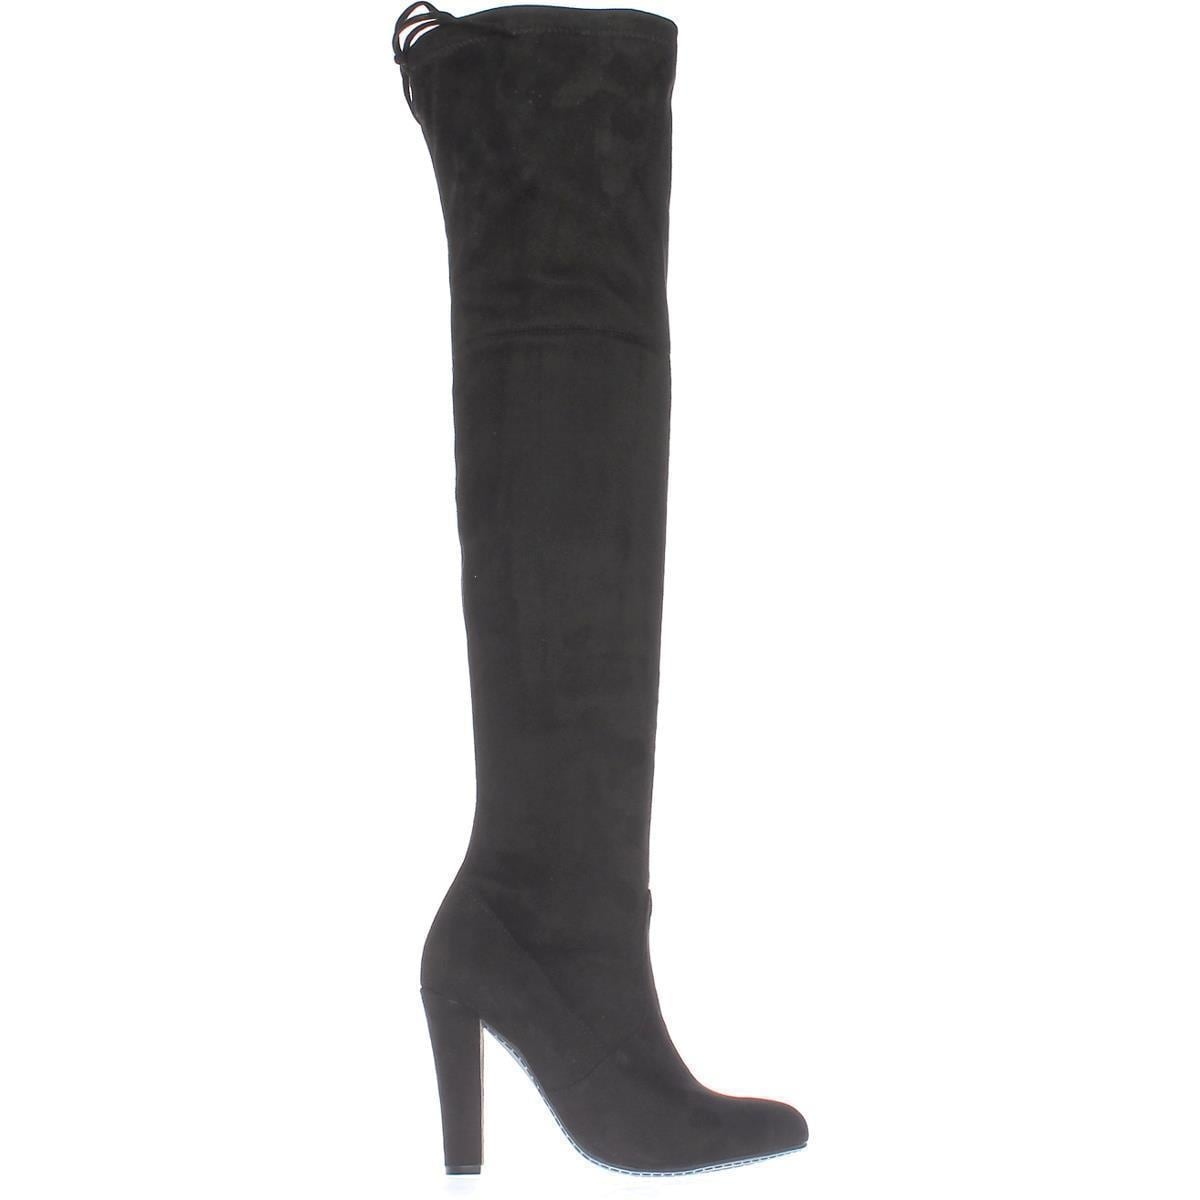 6fd21ba5e89 Steve Madden Gorgeous Over-The-Knee Dress Boots, Black